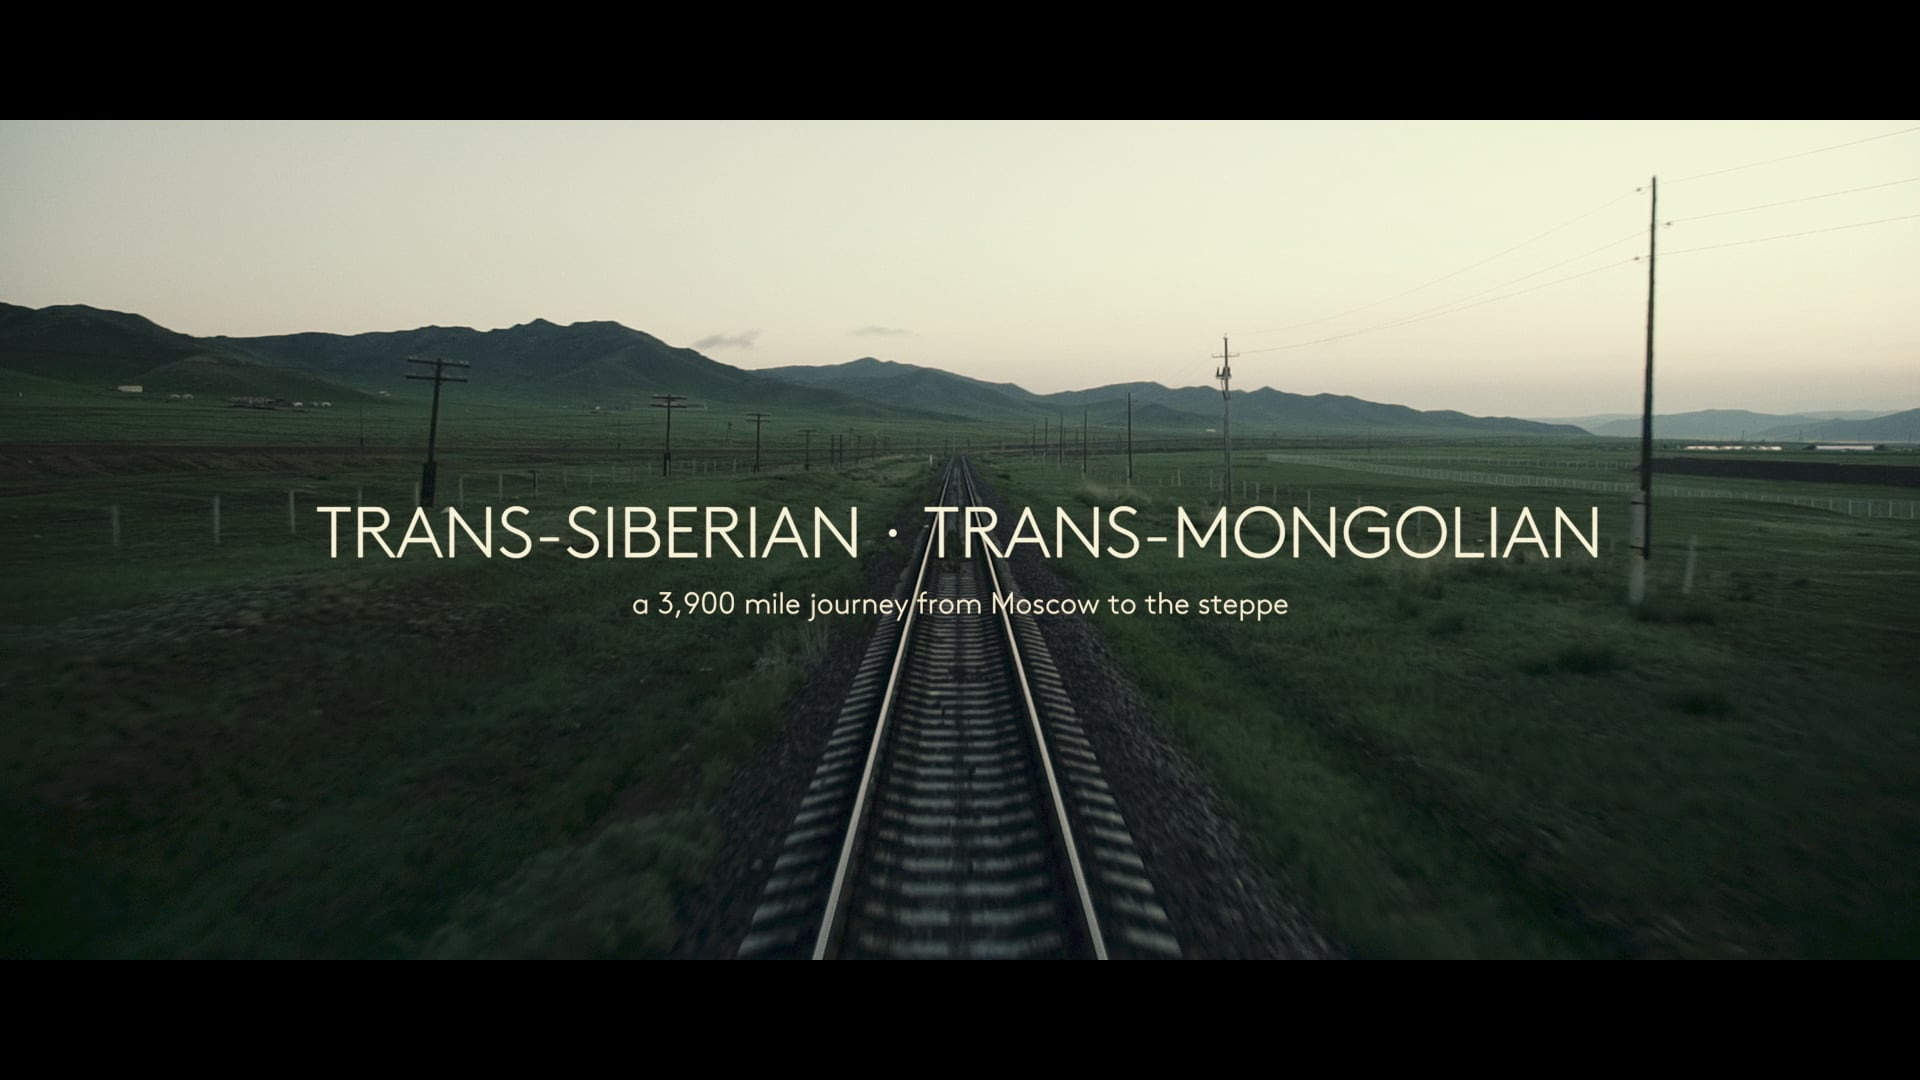 TRANS-SIBERIAN · TRANS-MONGOLIAN